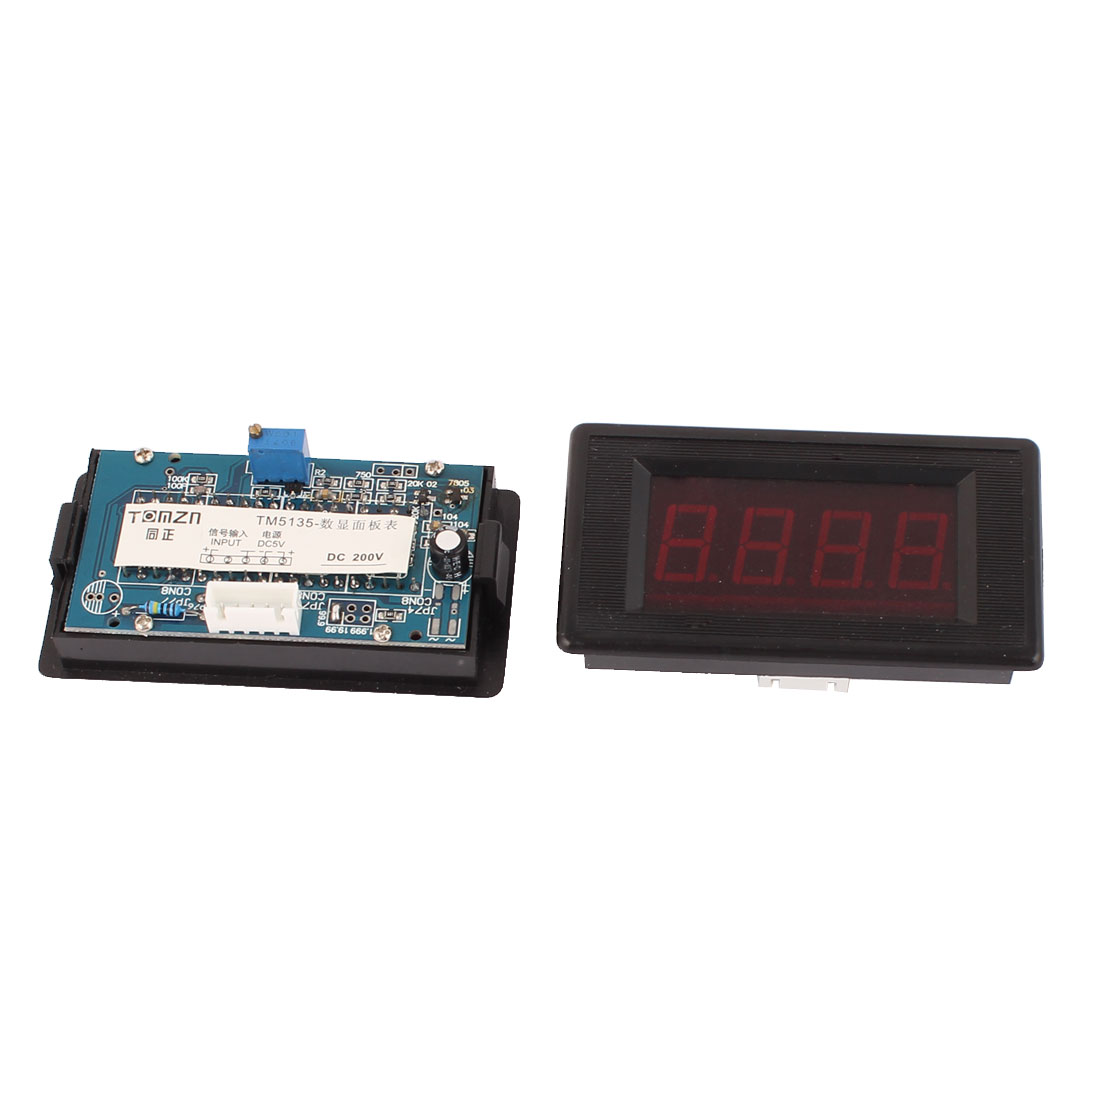 2Pcs Red LED Display 4 Digits DC 0-200V Range Digital Panel MountMeter Voltmeter